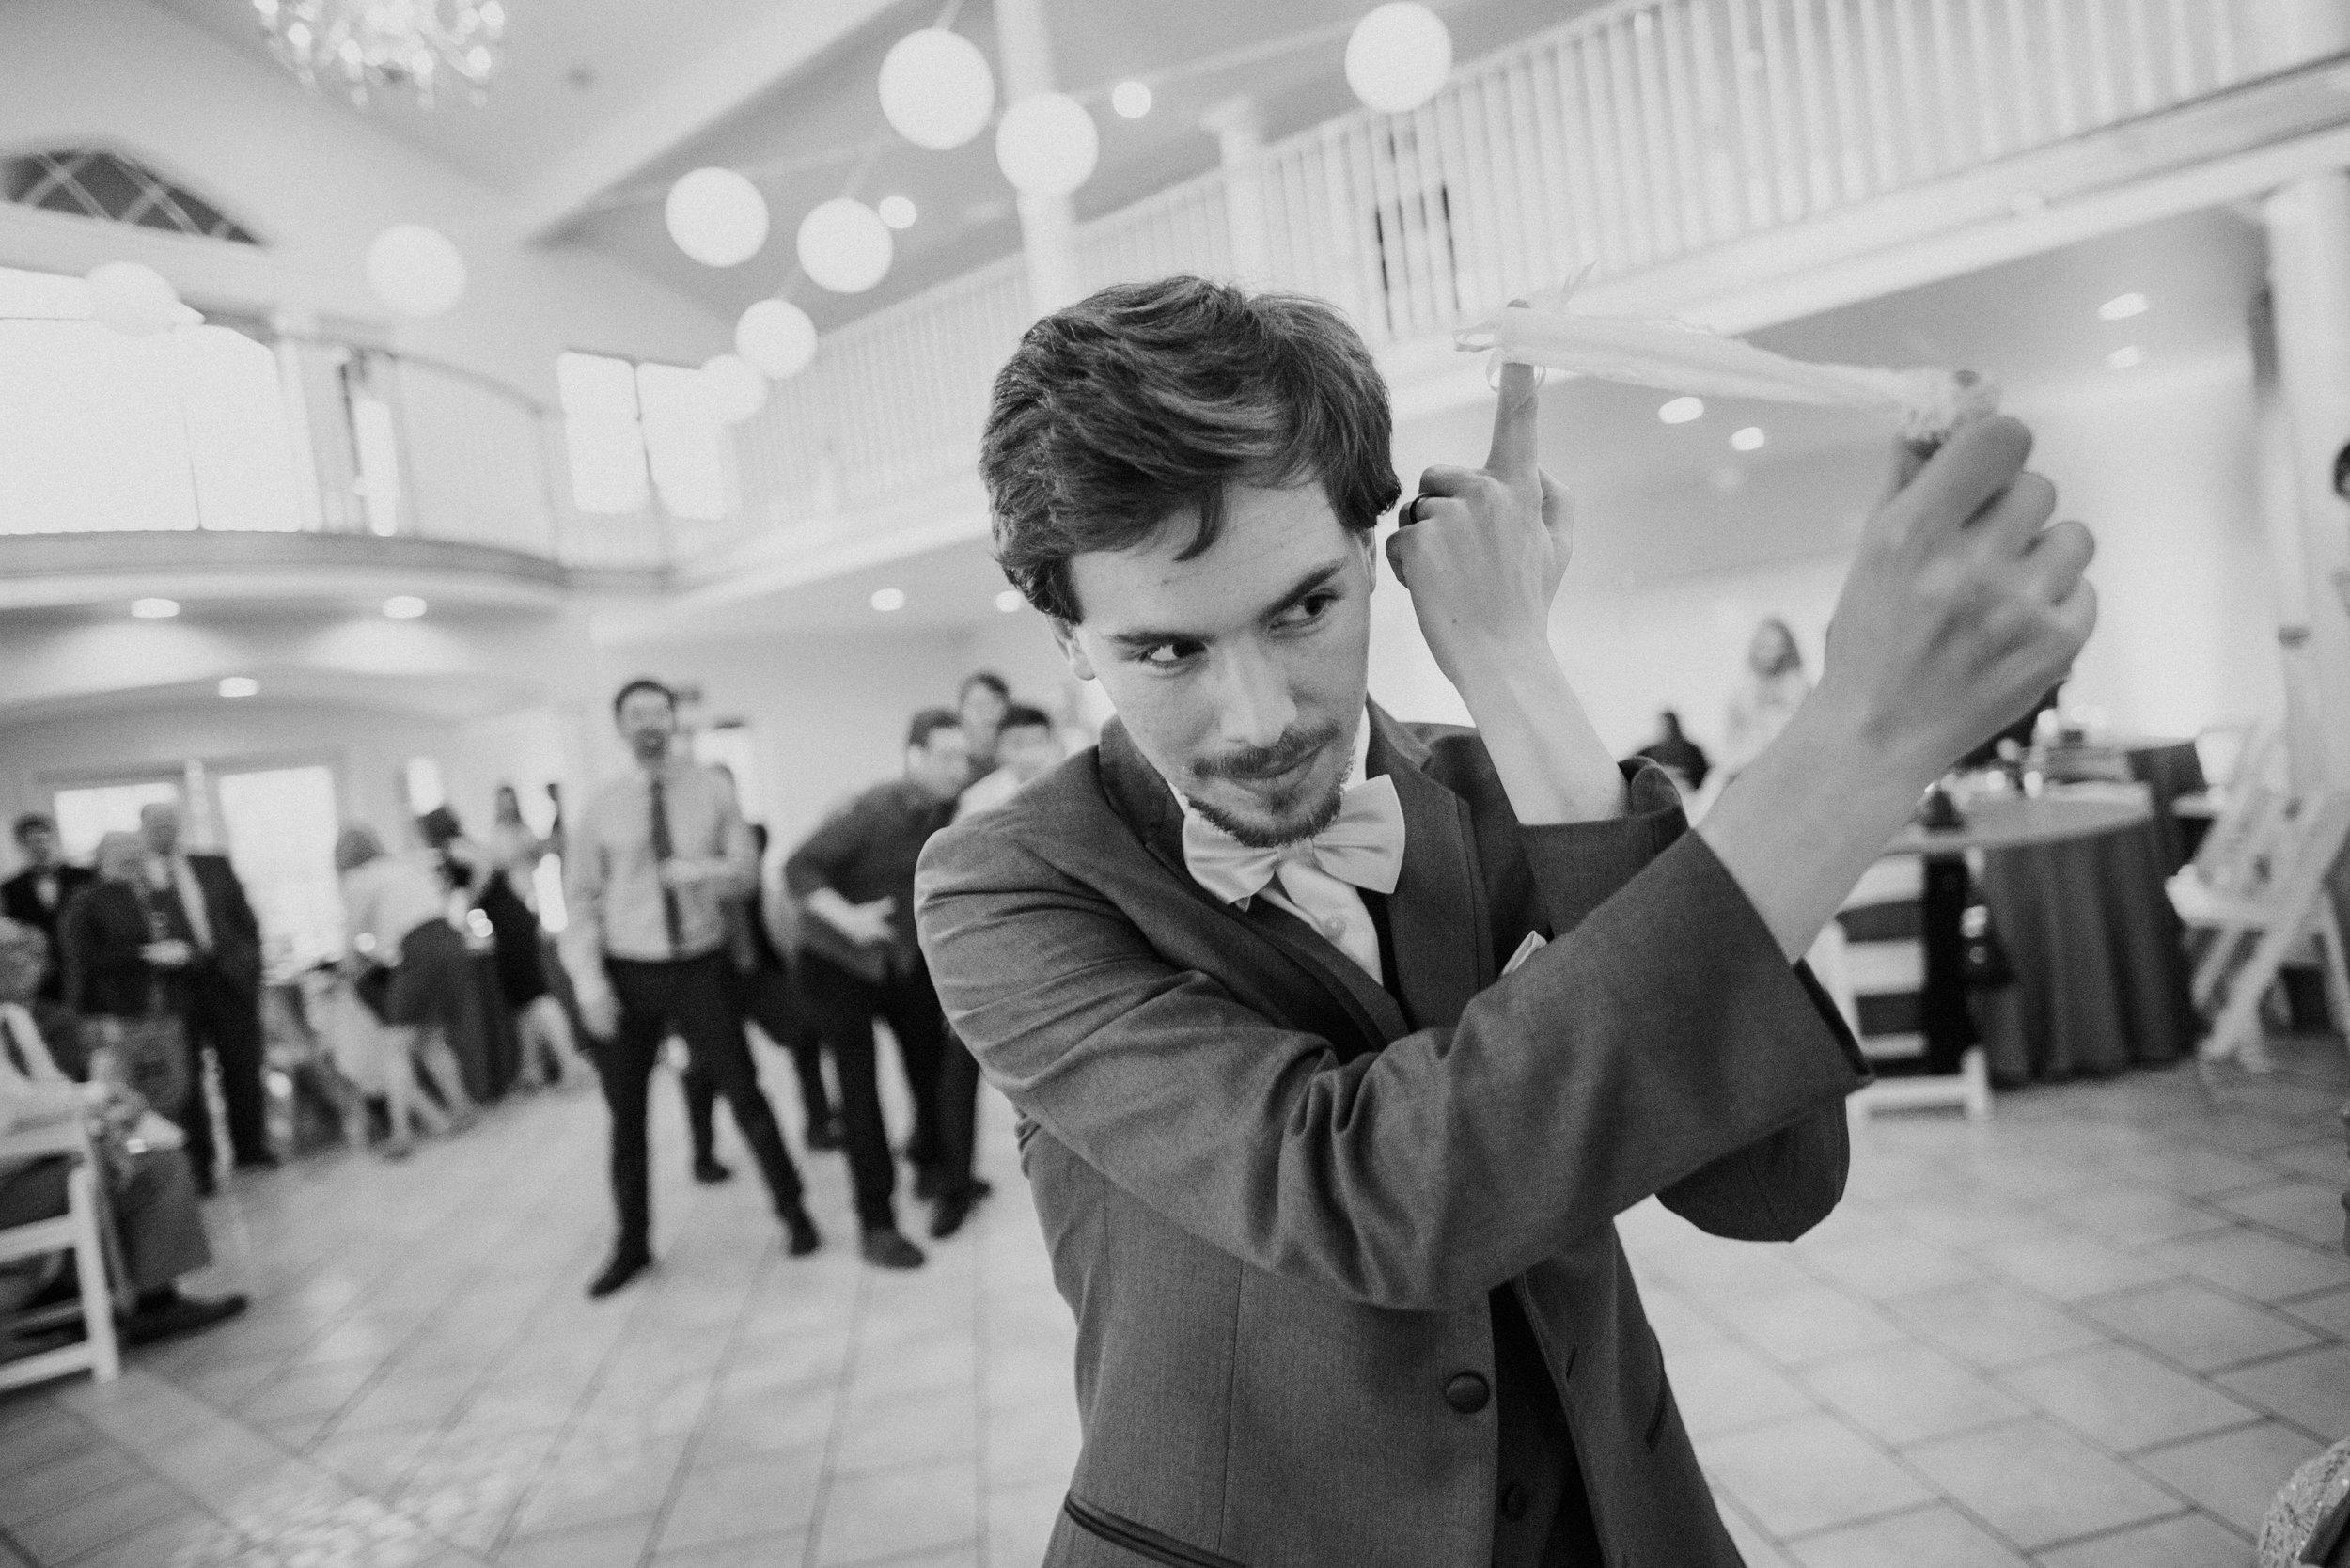 denver wedding photographer lioncrest manor in lyons ben and mali -DSC_0608.jpg